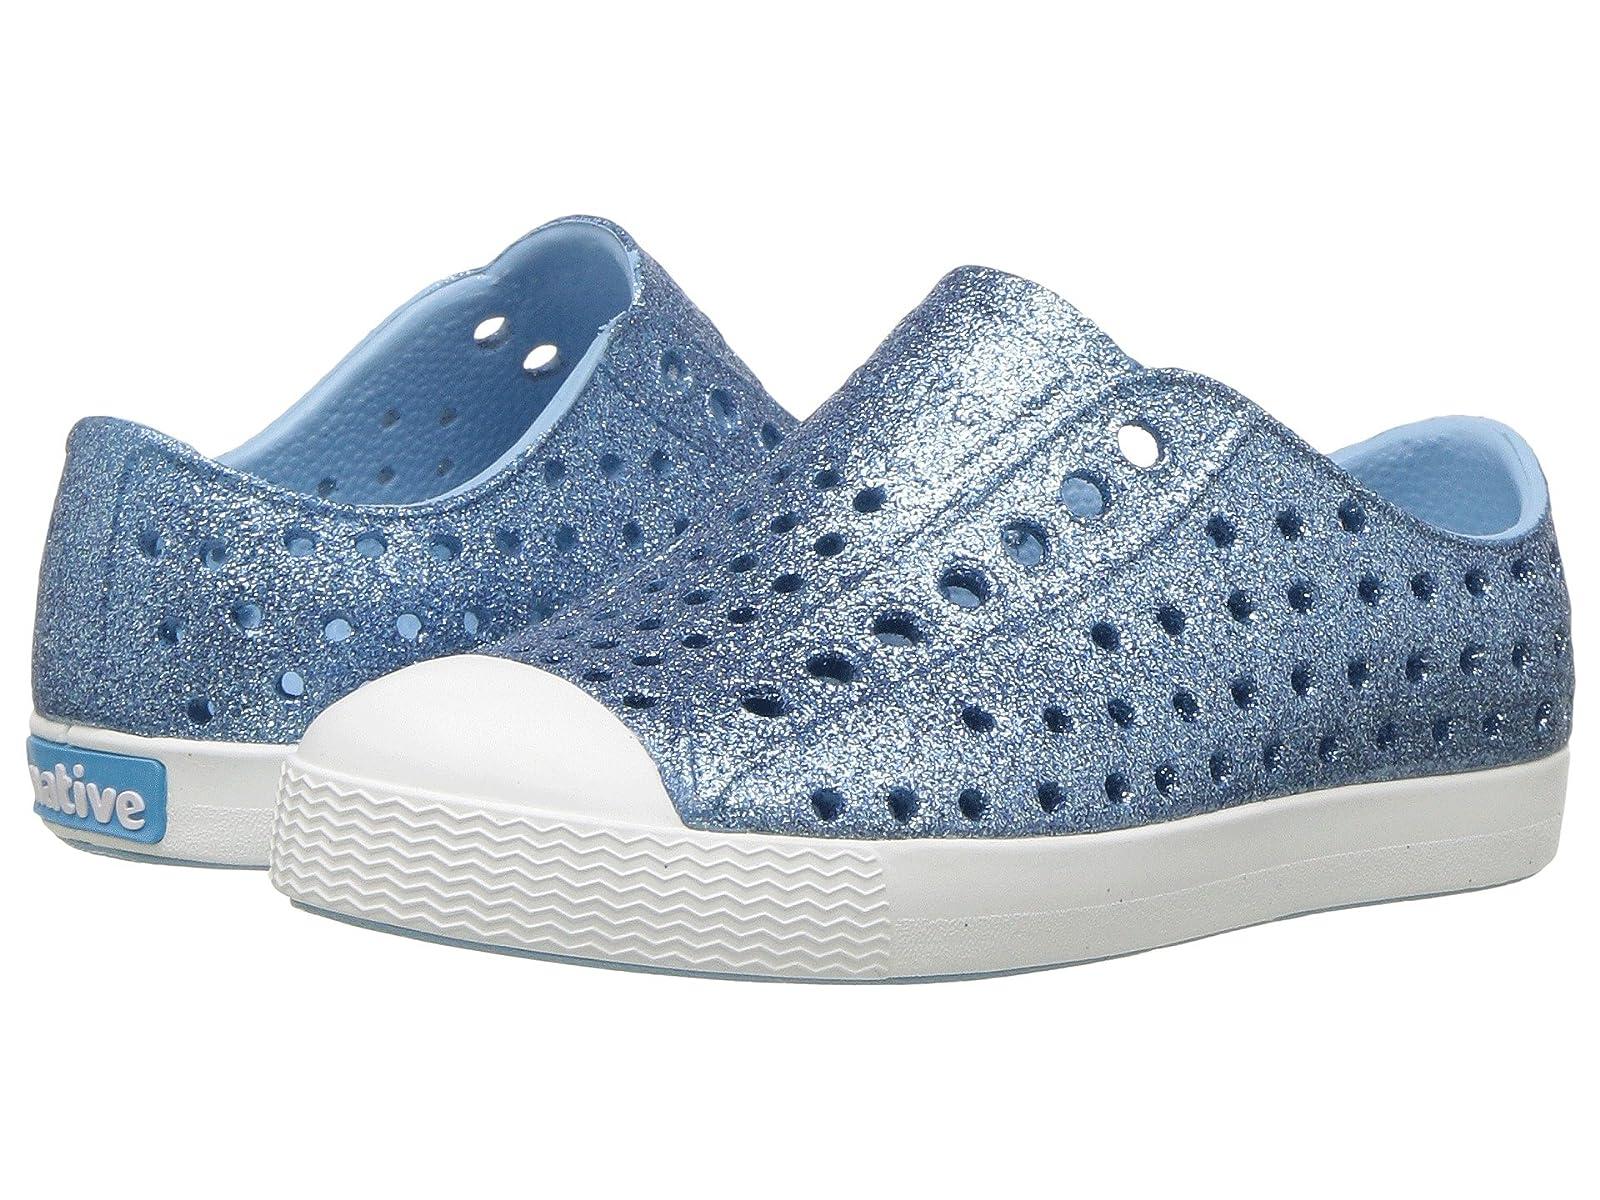 Native Kids Shoes Jefferson Bling Glitter (Toddler/Little Kid)Atmospheric grades have affordable shoes